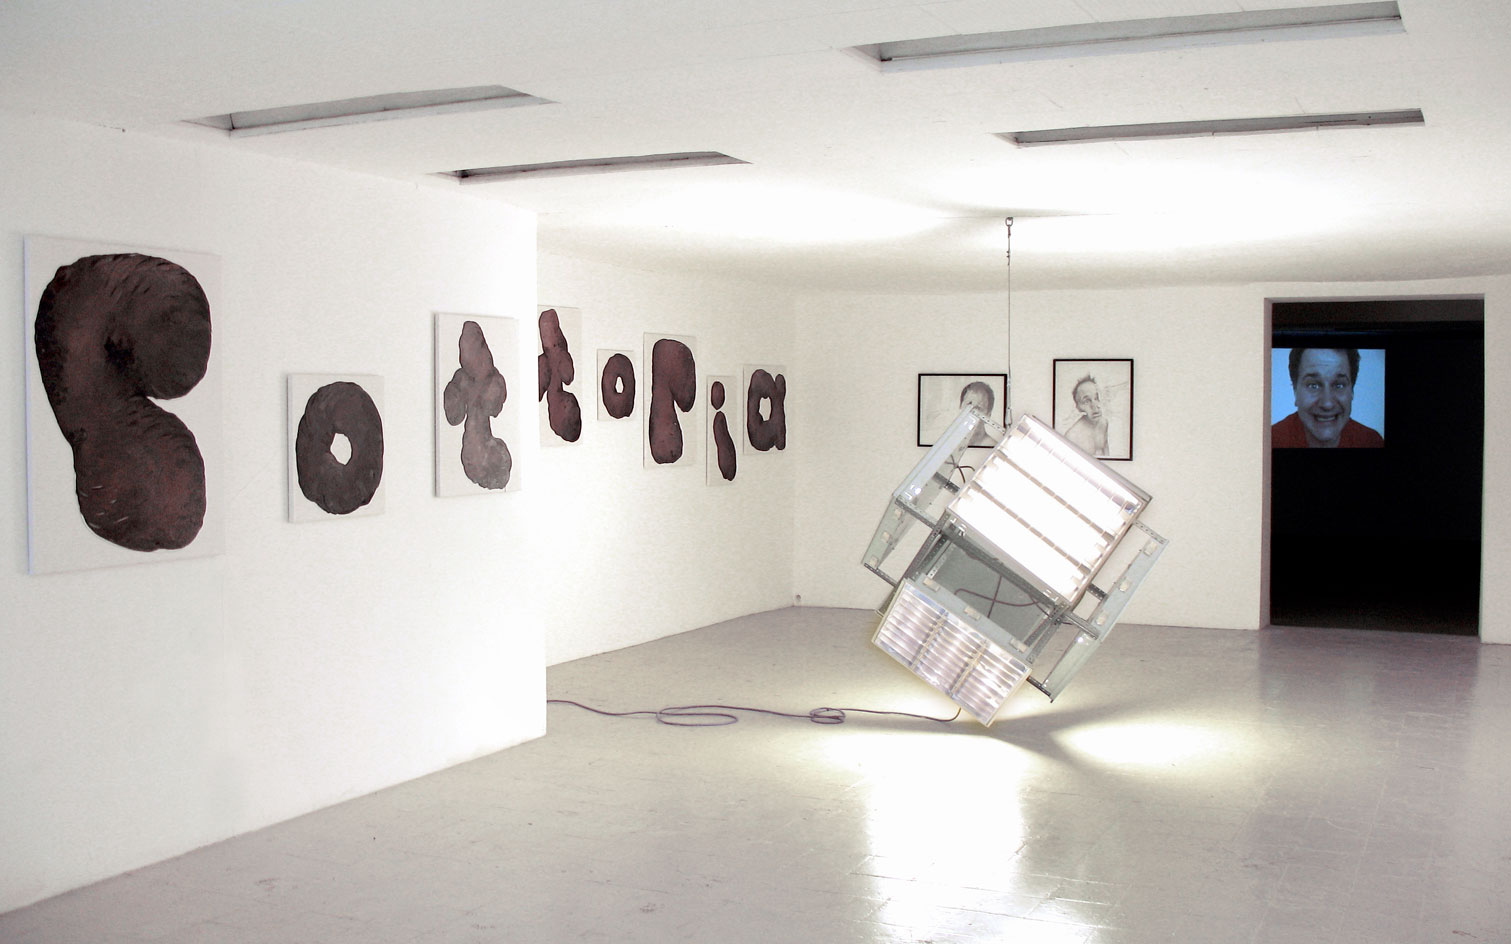 Les Schliesser – »Retrogard Avantspective«, mit Colin Cook, SMP Marseille, 2006